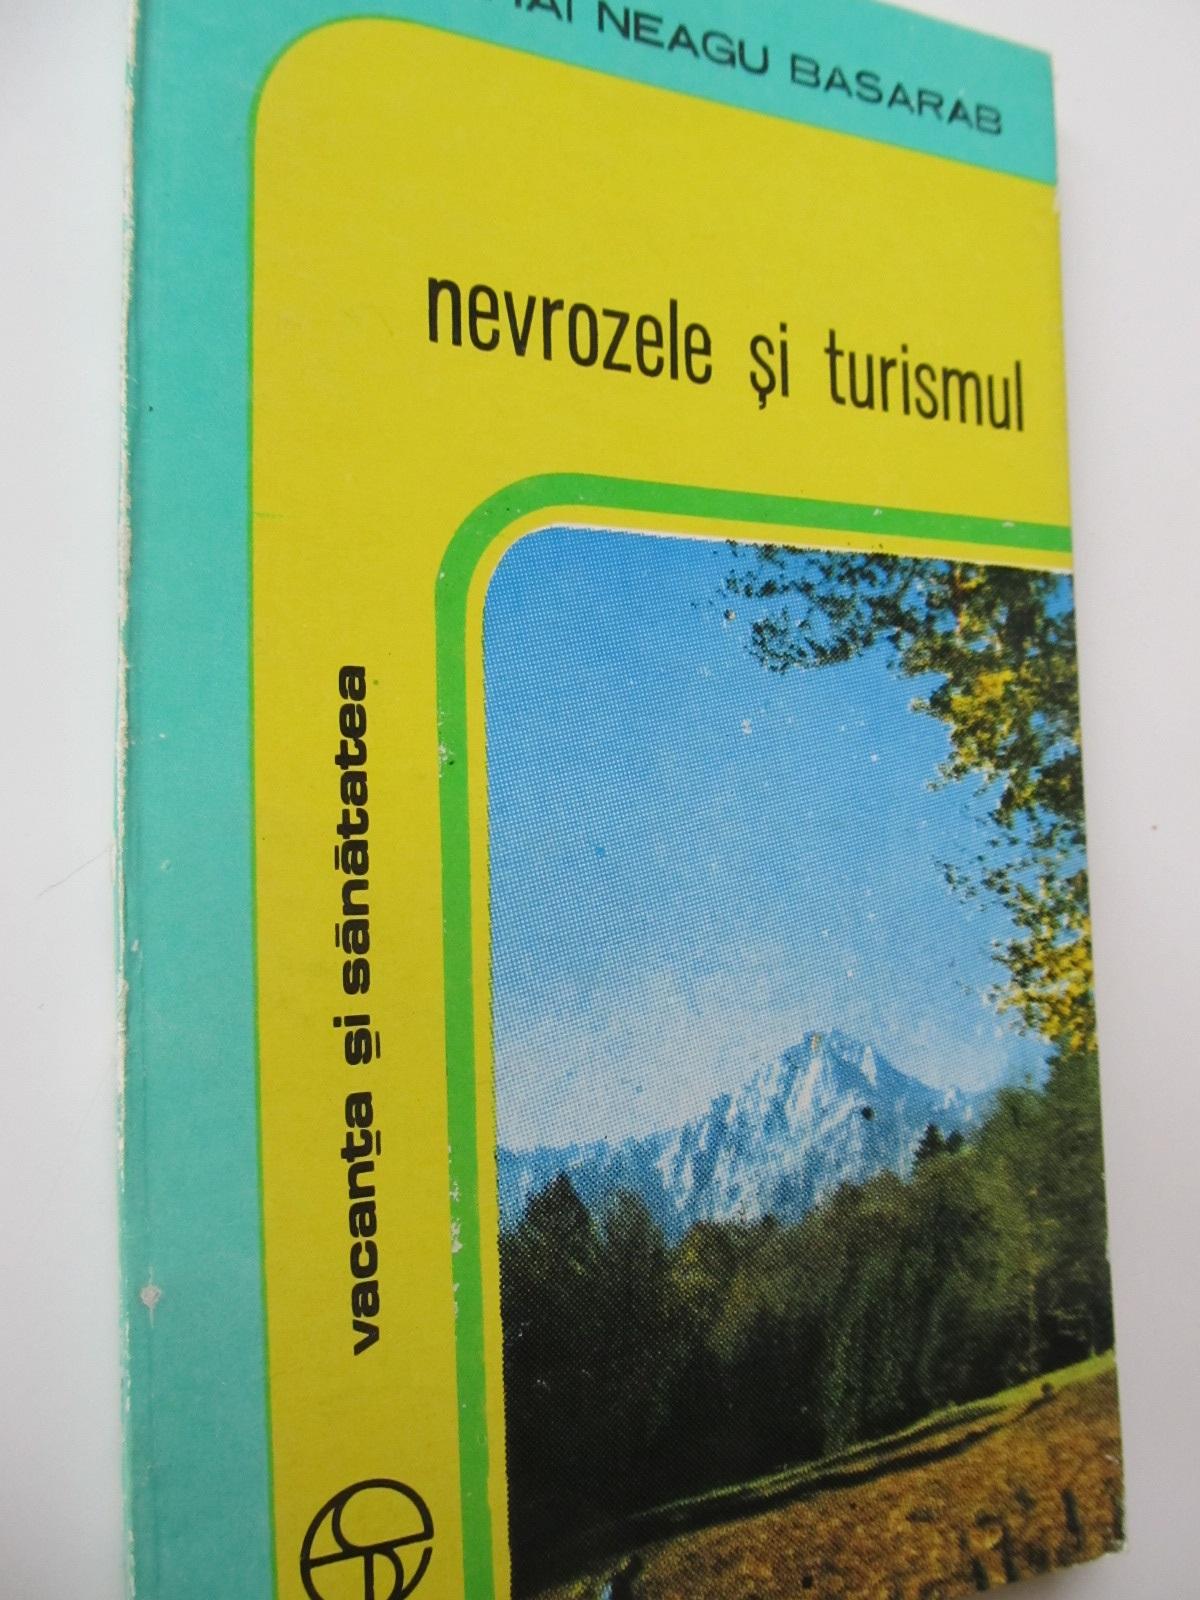 Nevrozele si trismul - Mihai Neagu Basarab | Detalii carte